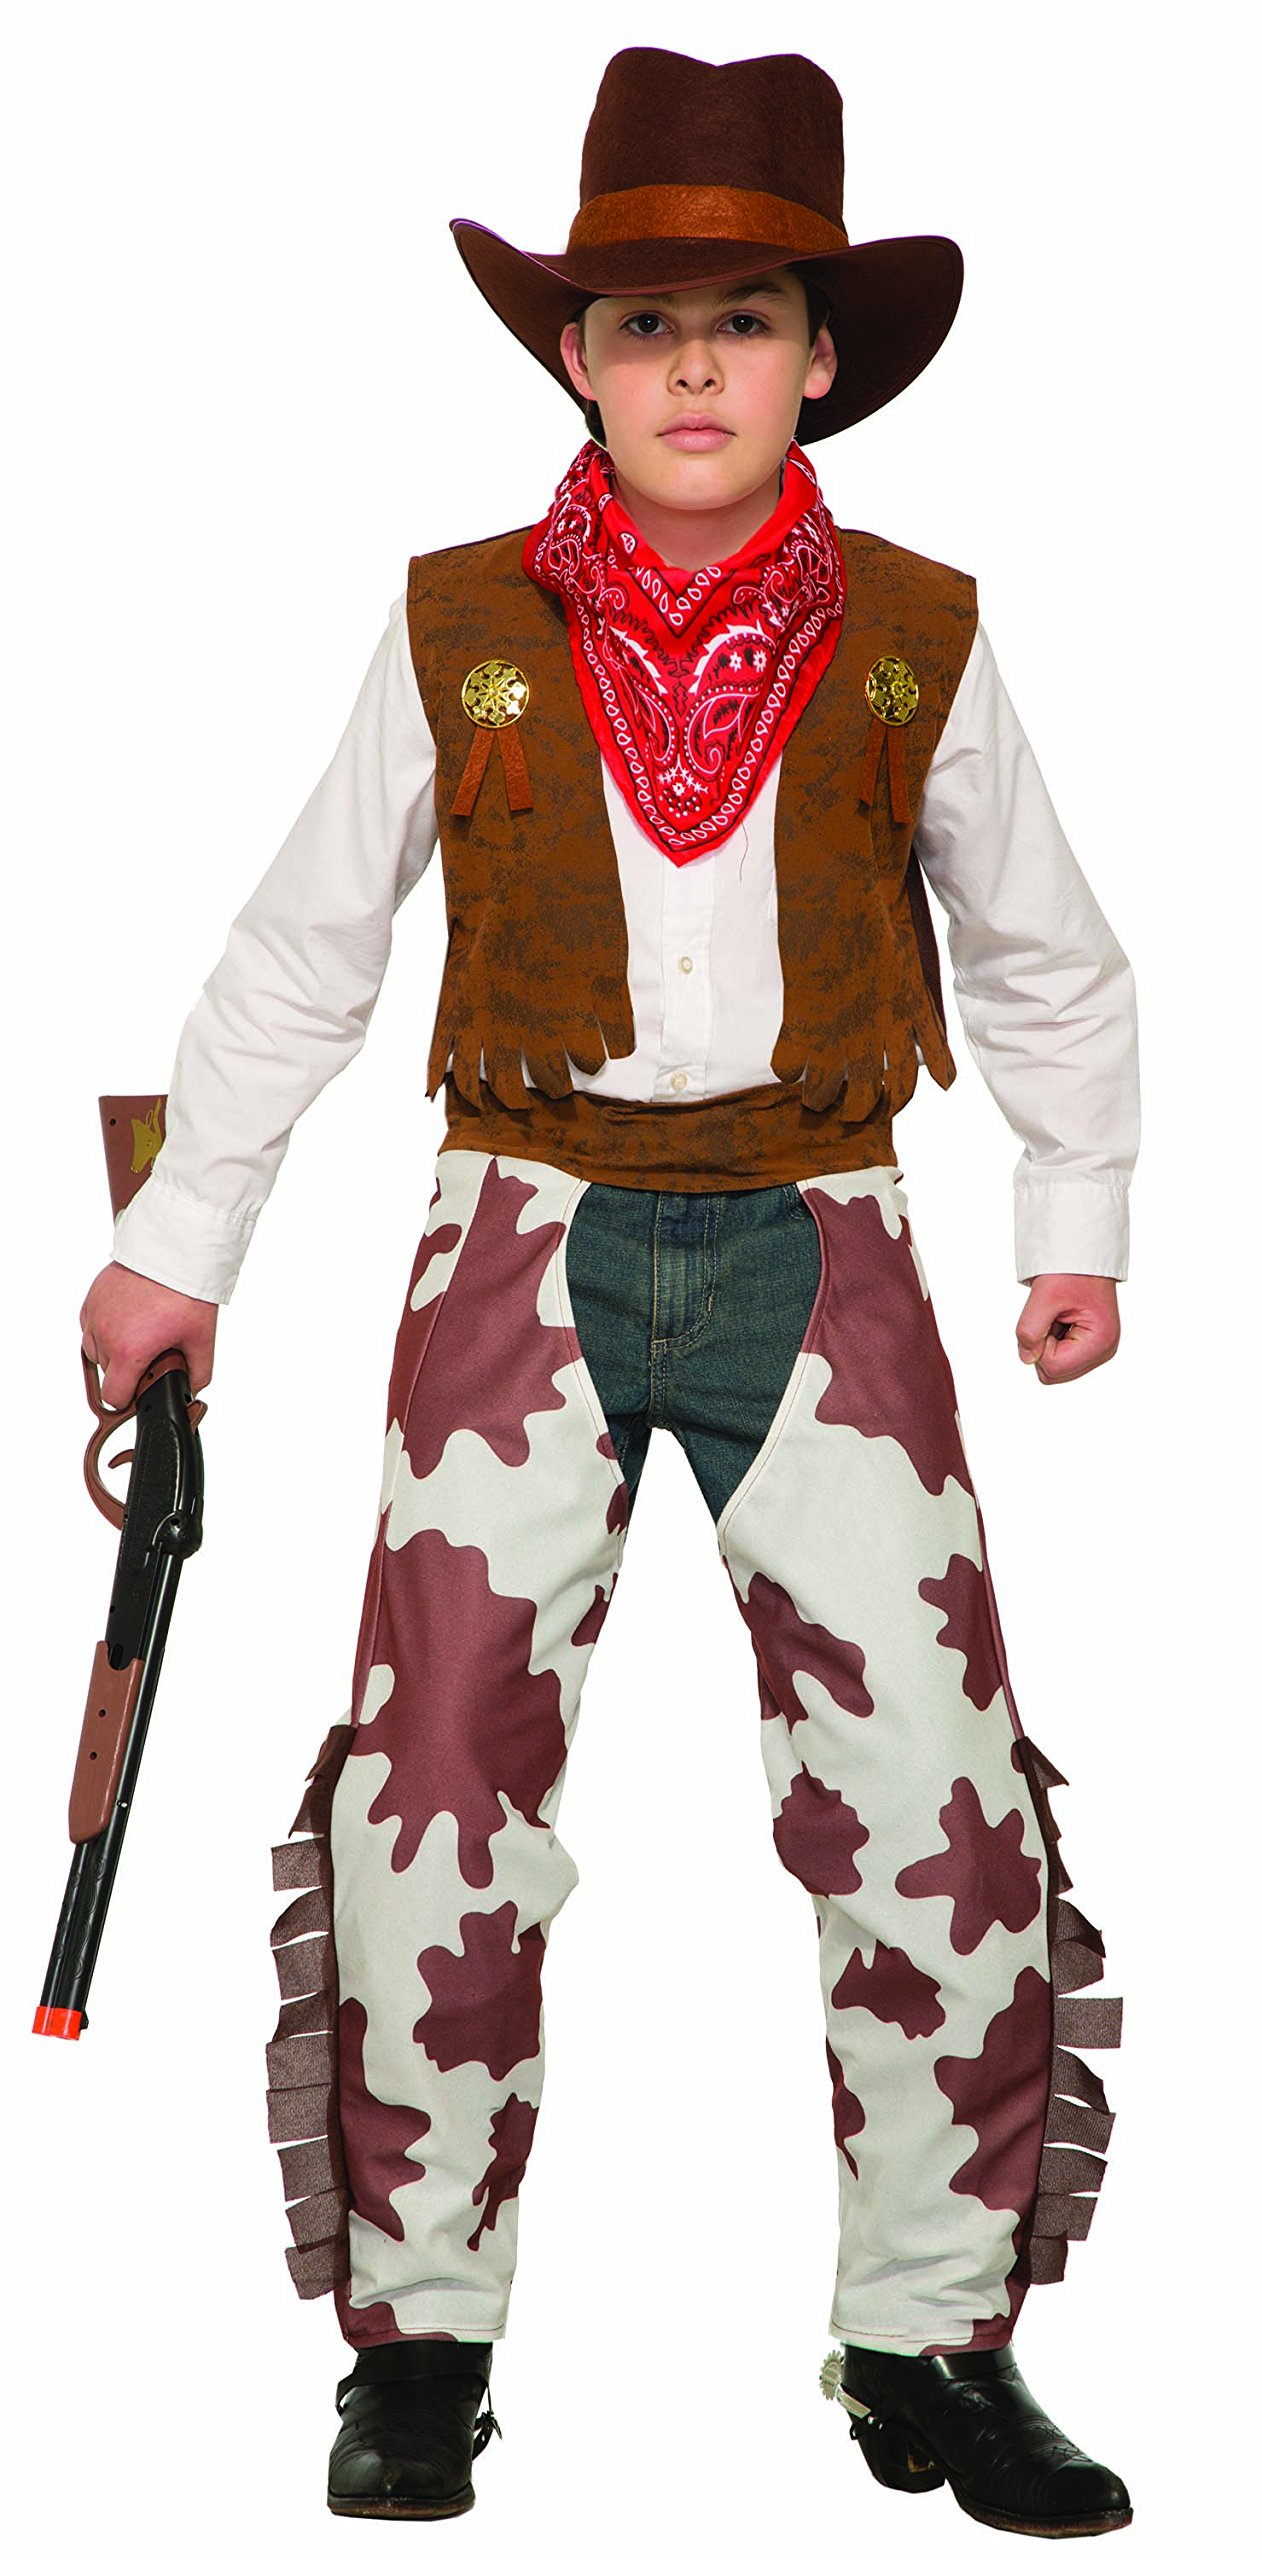 Forum Novelties Cowboy Costume, As Shown, Large by Forum Novelties (Image #1)